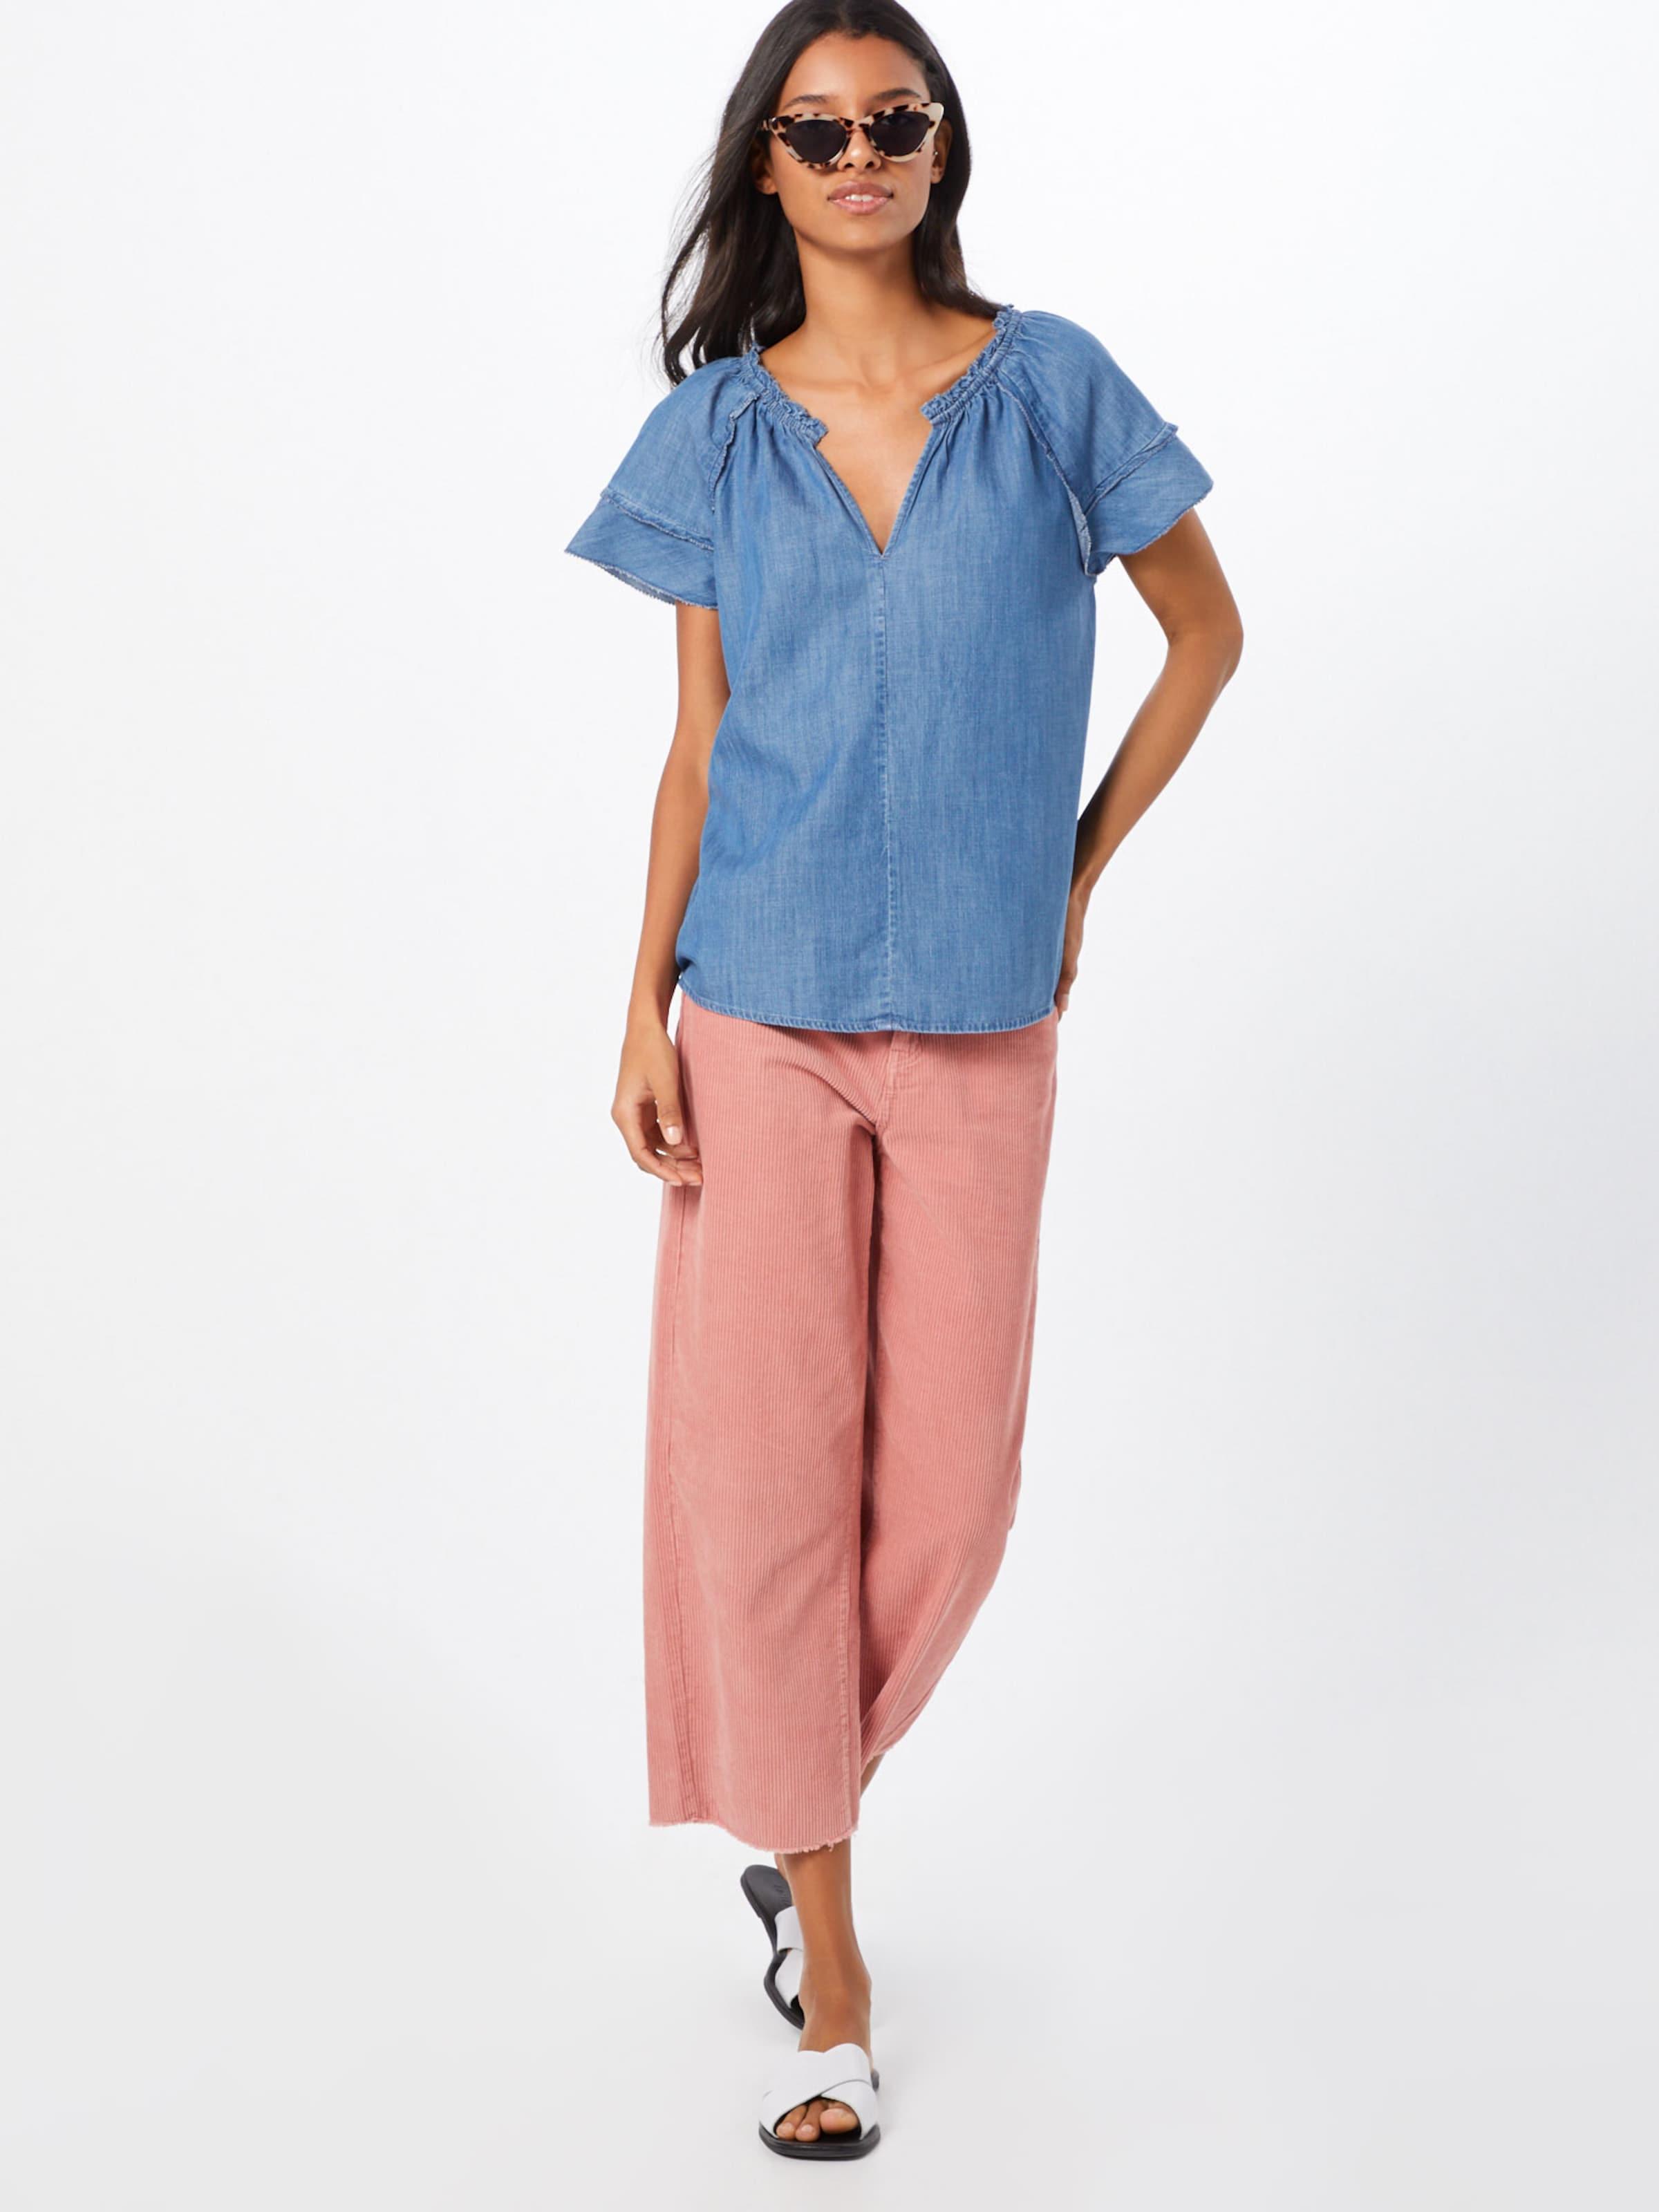 T Indigo 'fltr TopChambray' Zen En Gap shirt Ss wOuTXZiPk